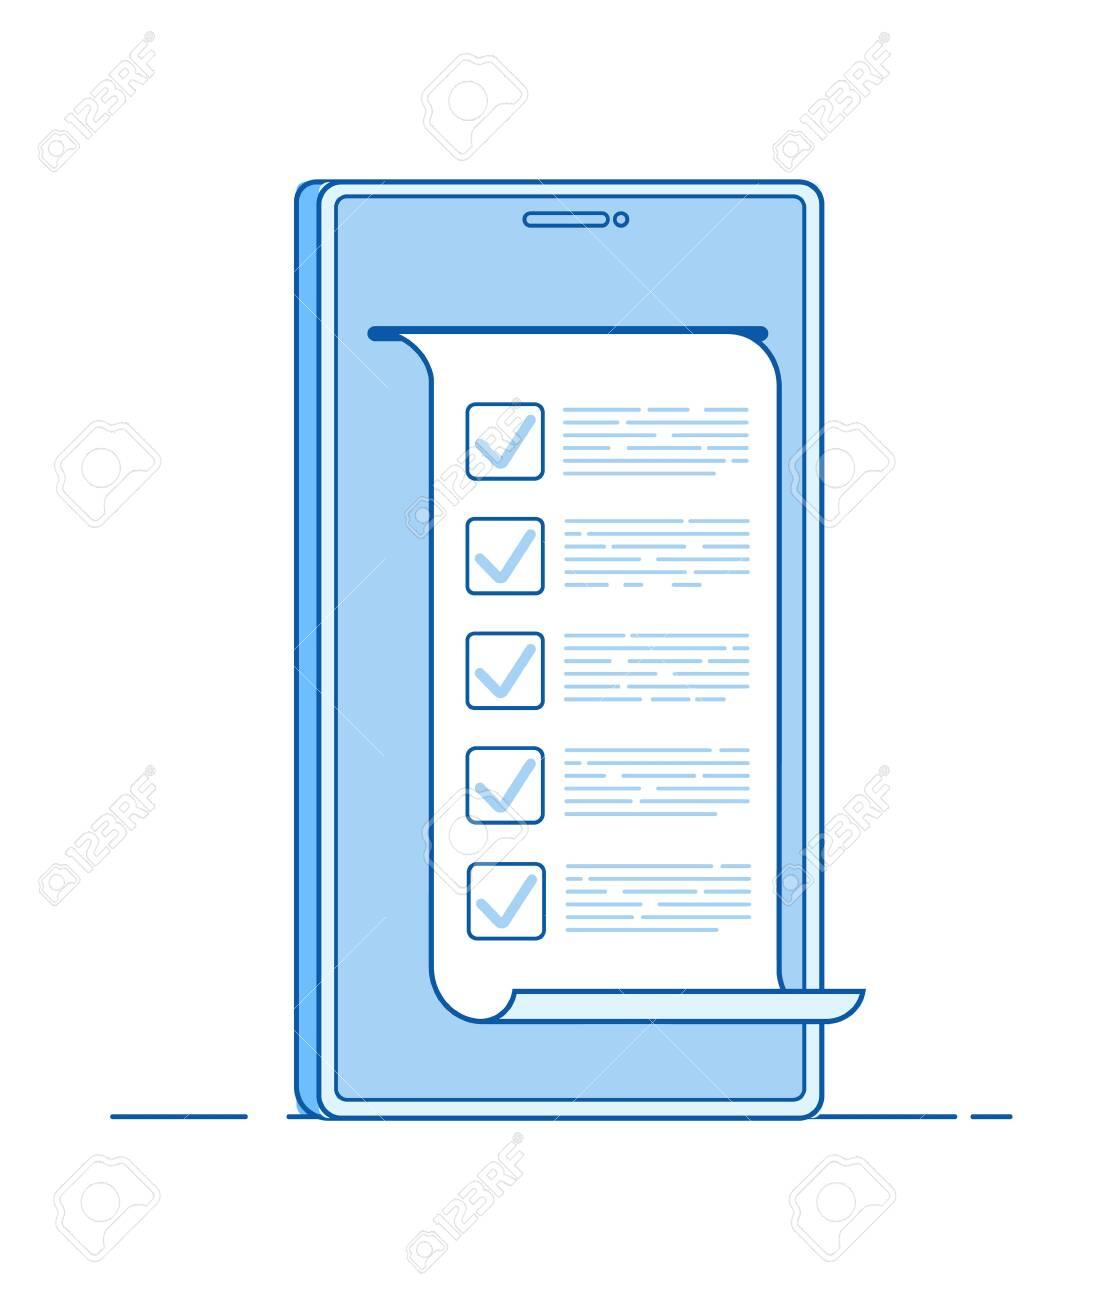 Online test  Computer quiz form on smartphone  Online to do list